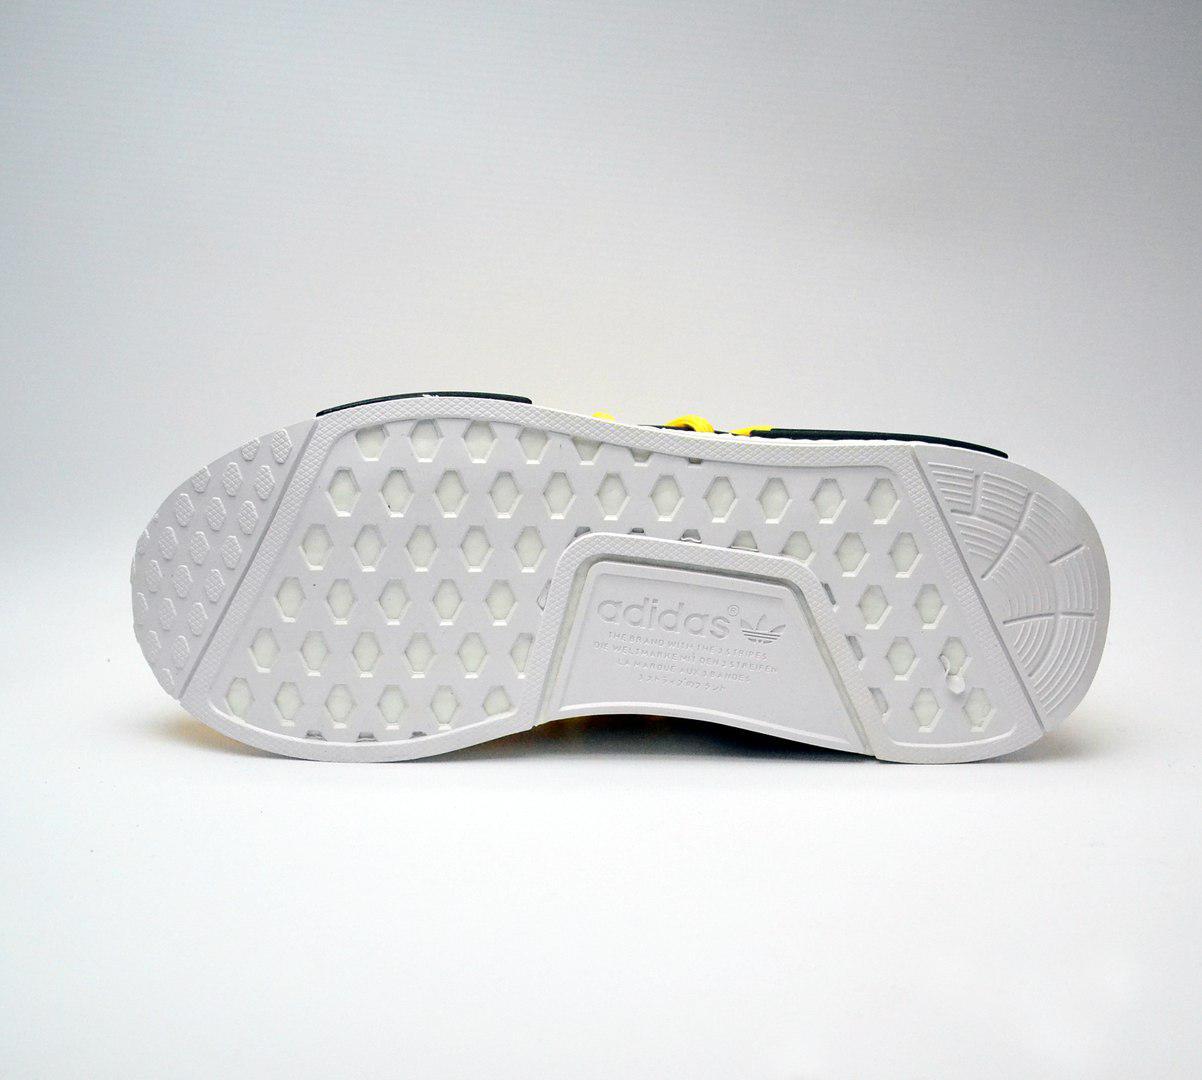 5517cdc1 ... фото Мужские Кроссовки Adidas originals ×pharrell williams nmd Human  Race yellow (копия), ...